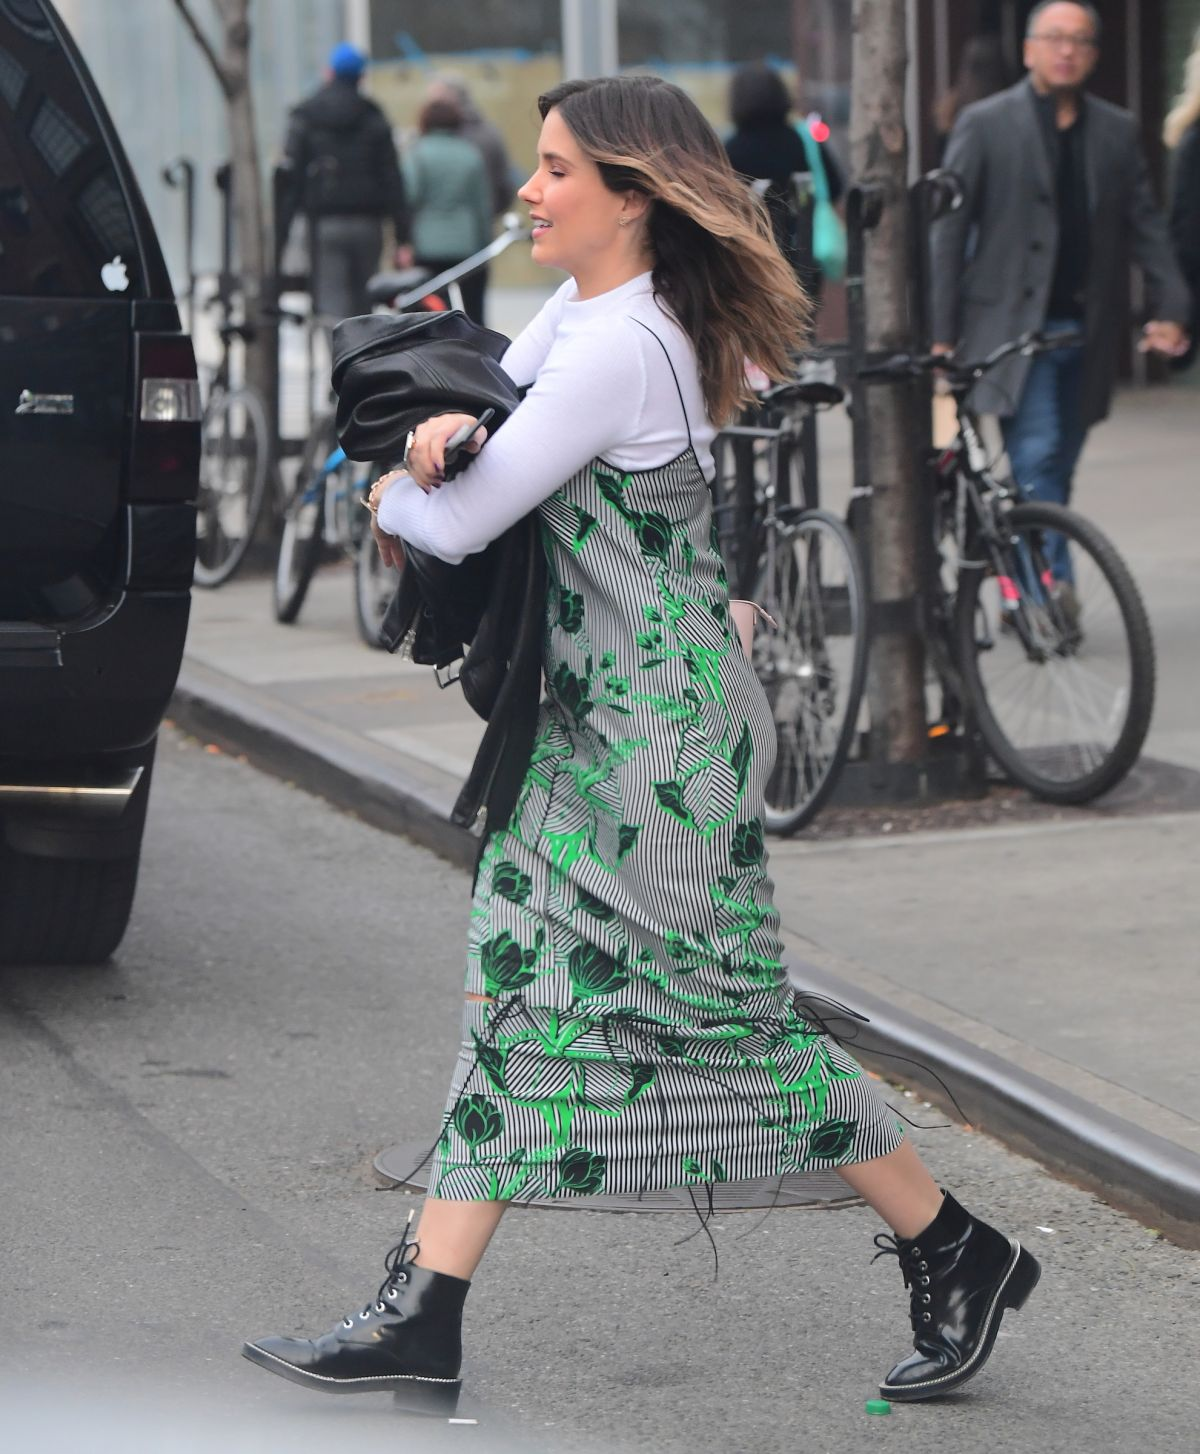 Sophia Bush rush for riding her car in New York